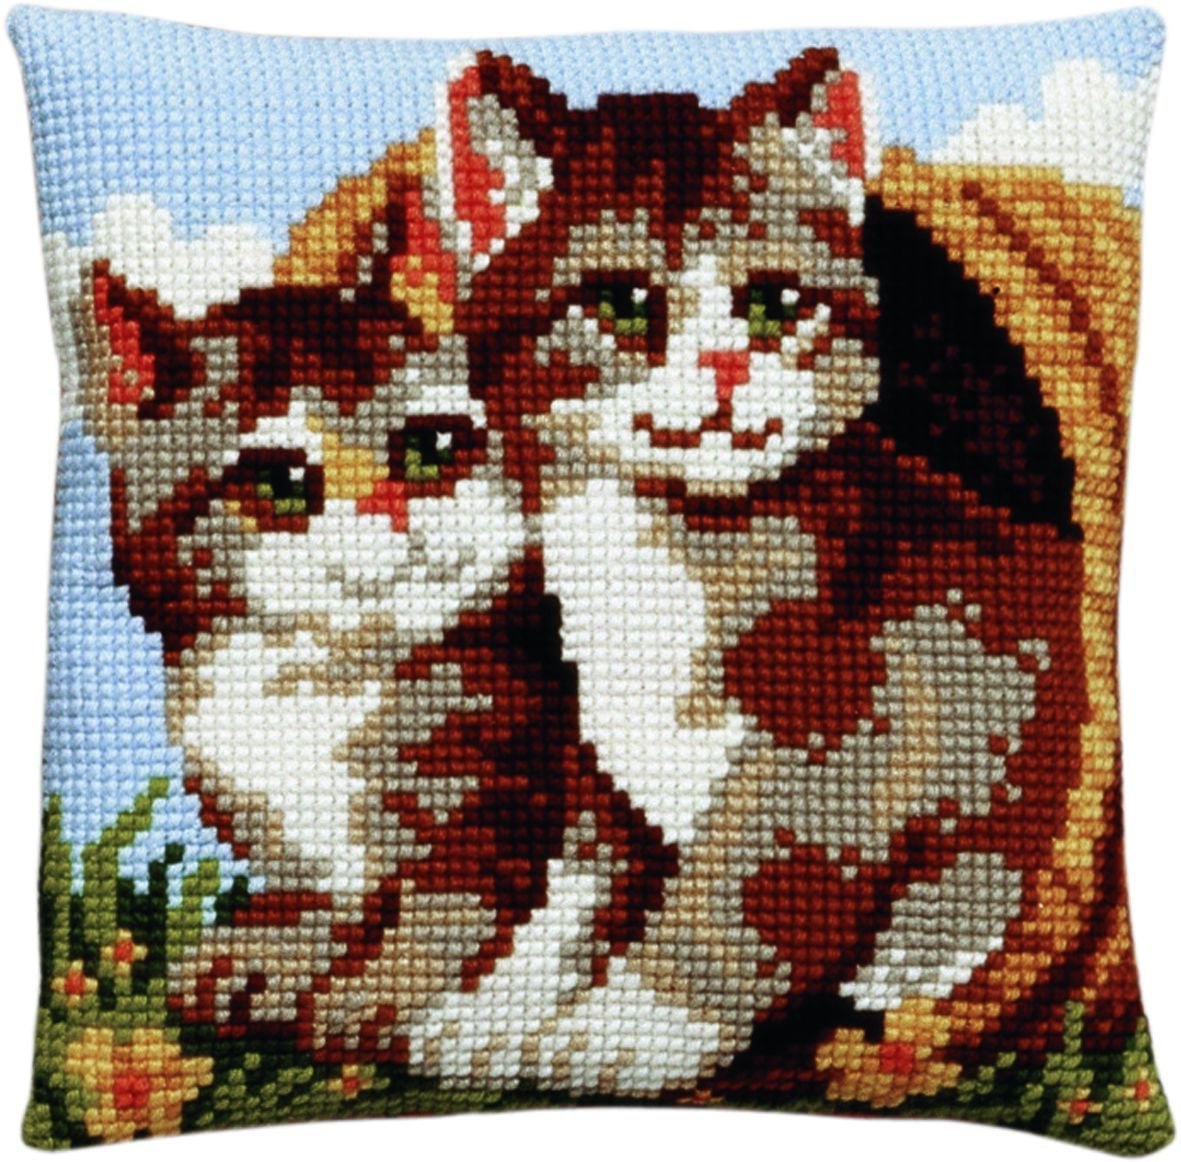 cross stitch two kittens in a wicker basket printed